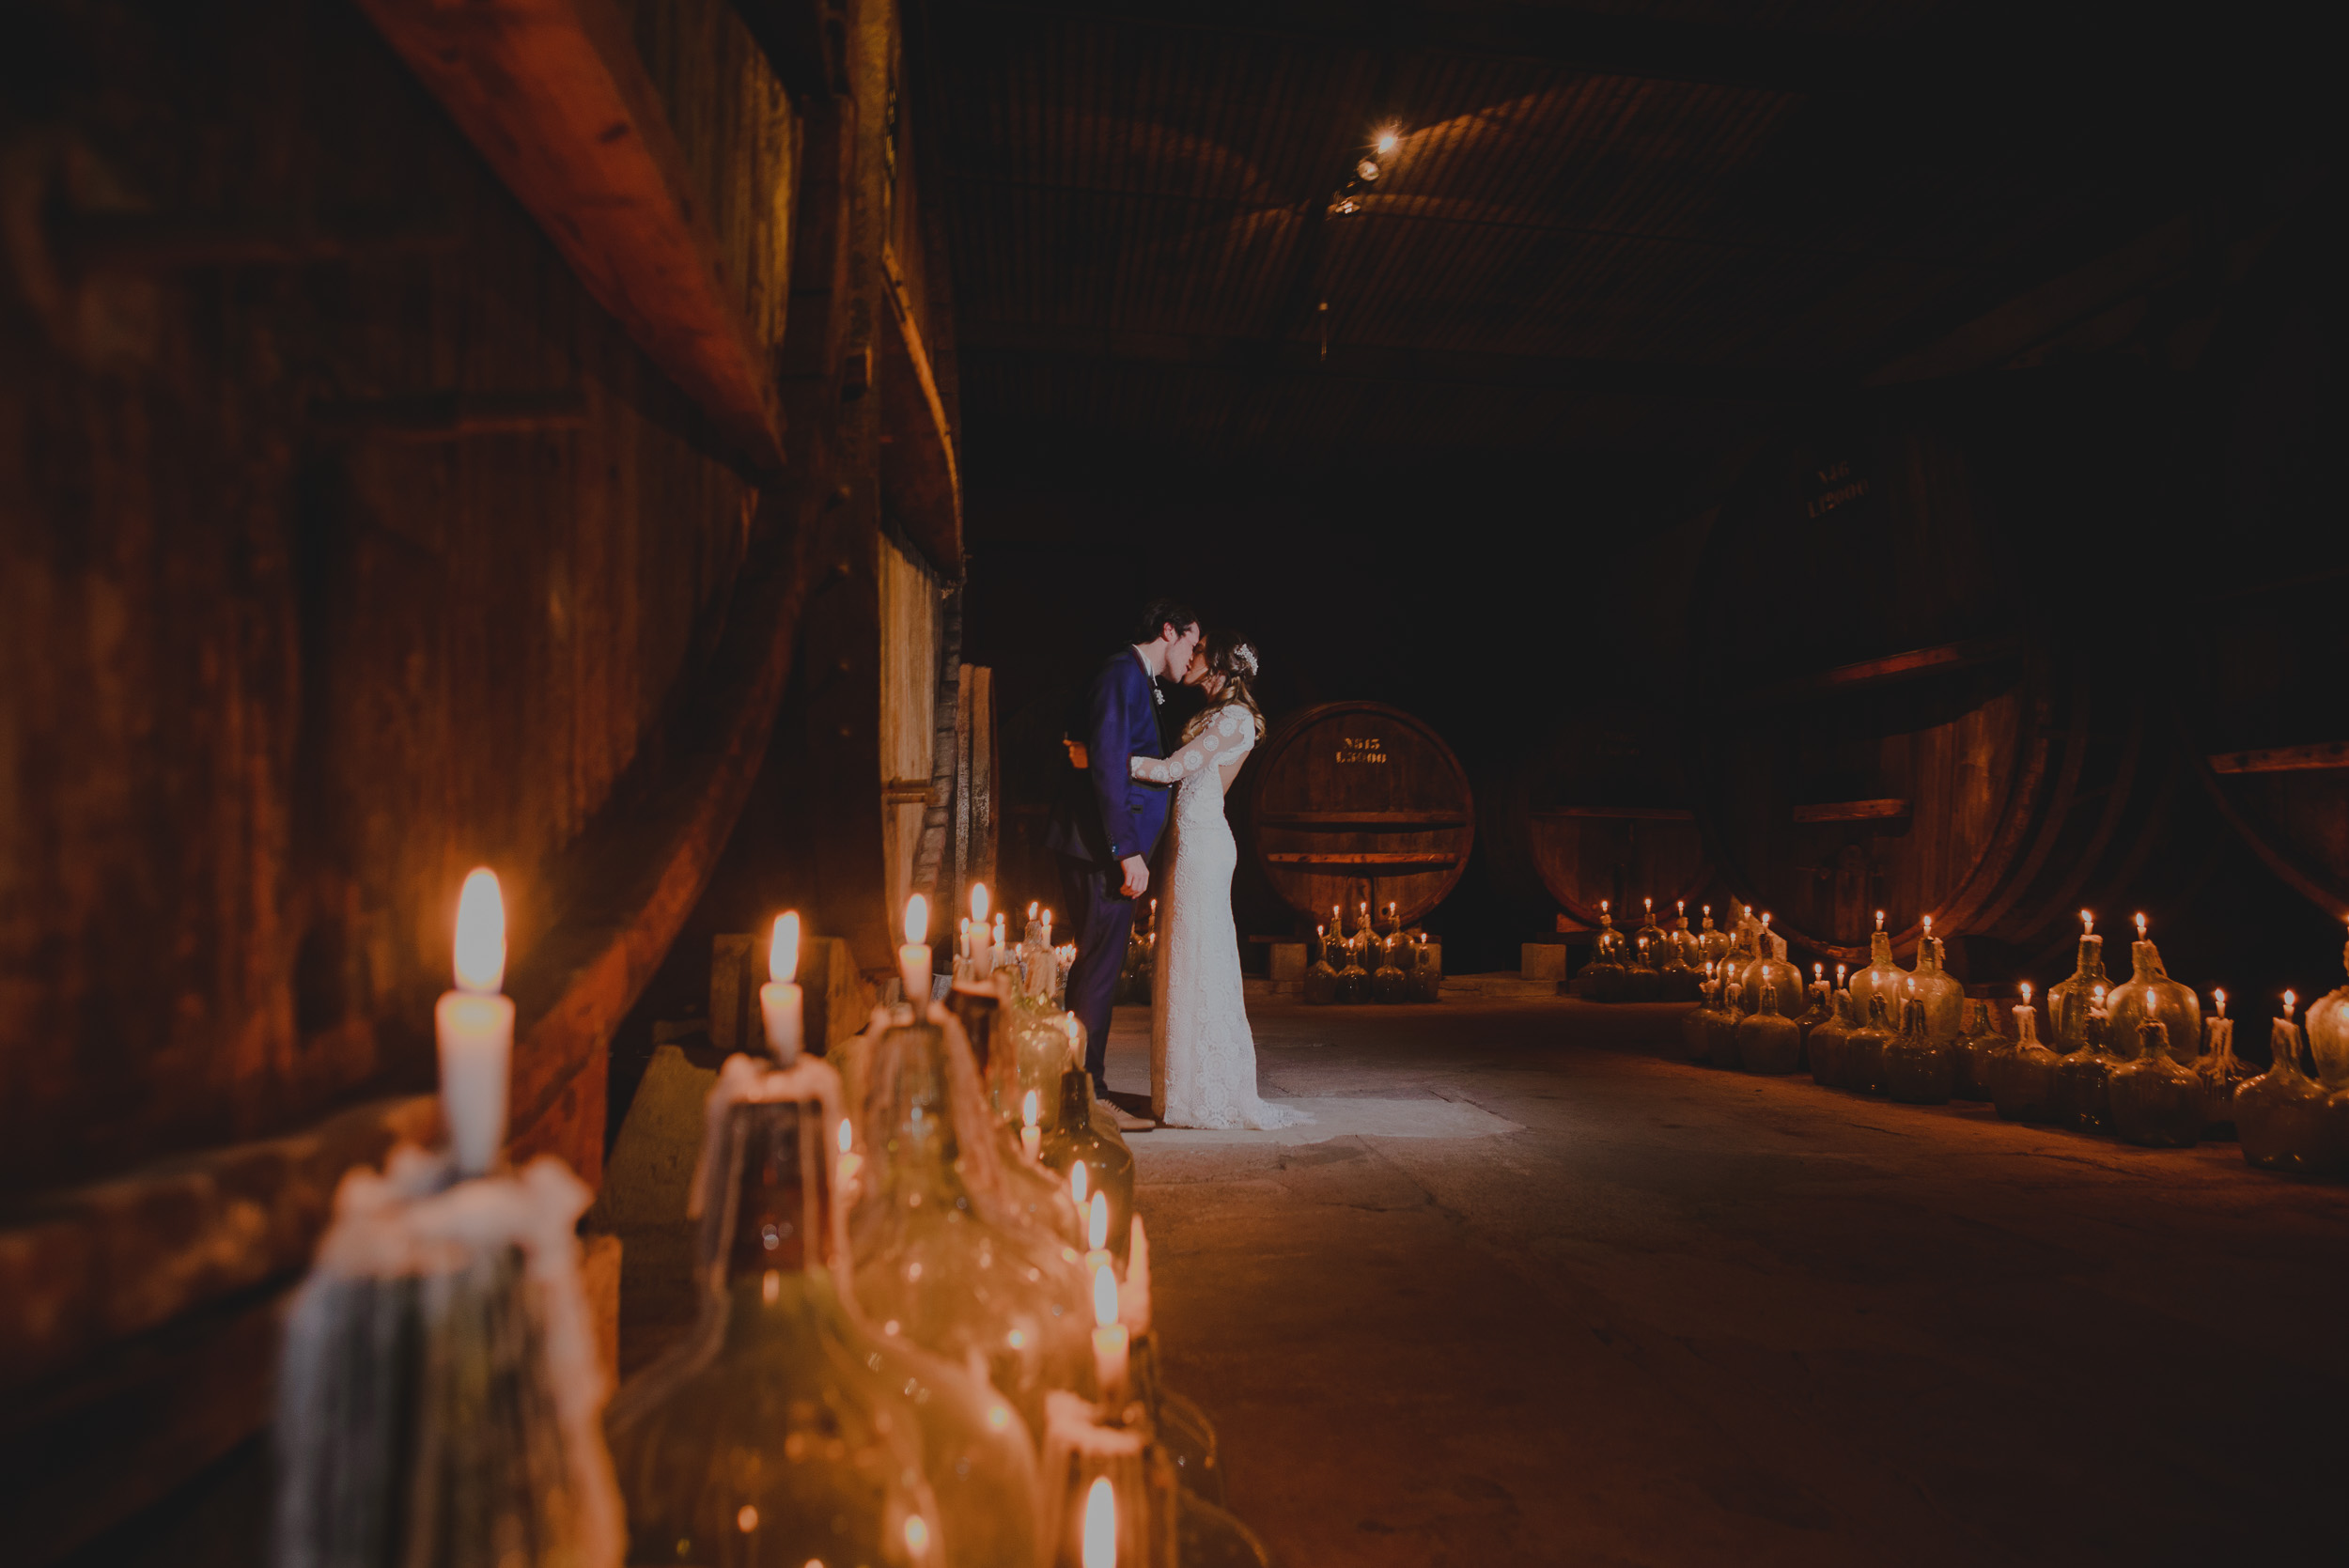 Mati & Juan boda en Bodega Jacksonville , FOTOGRAFIA DE BODA POITEVIN LOPEZ-119a (1)